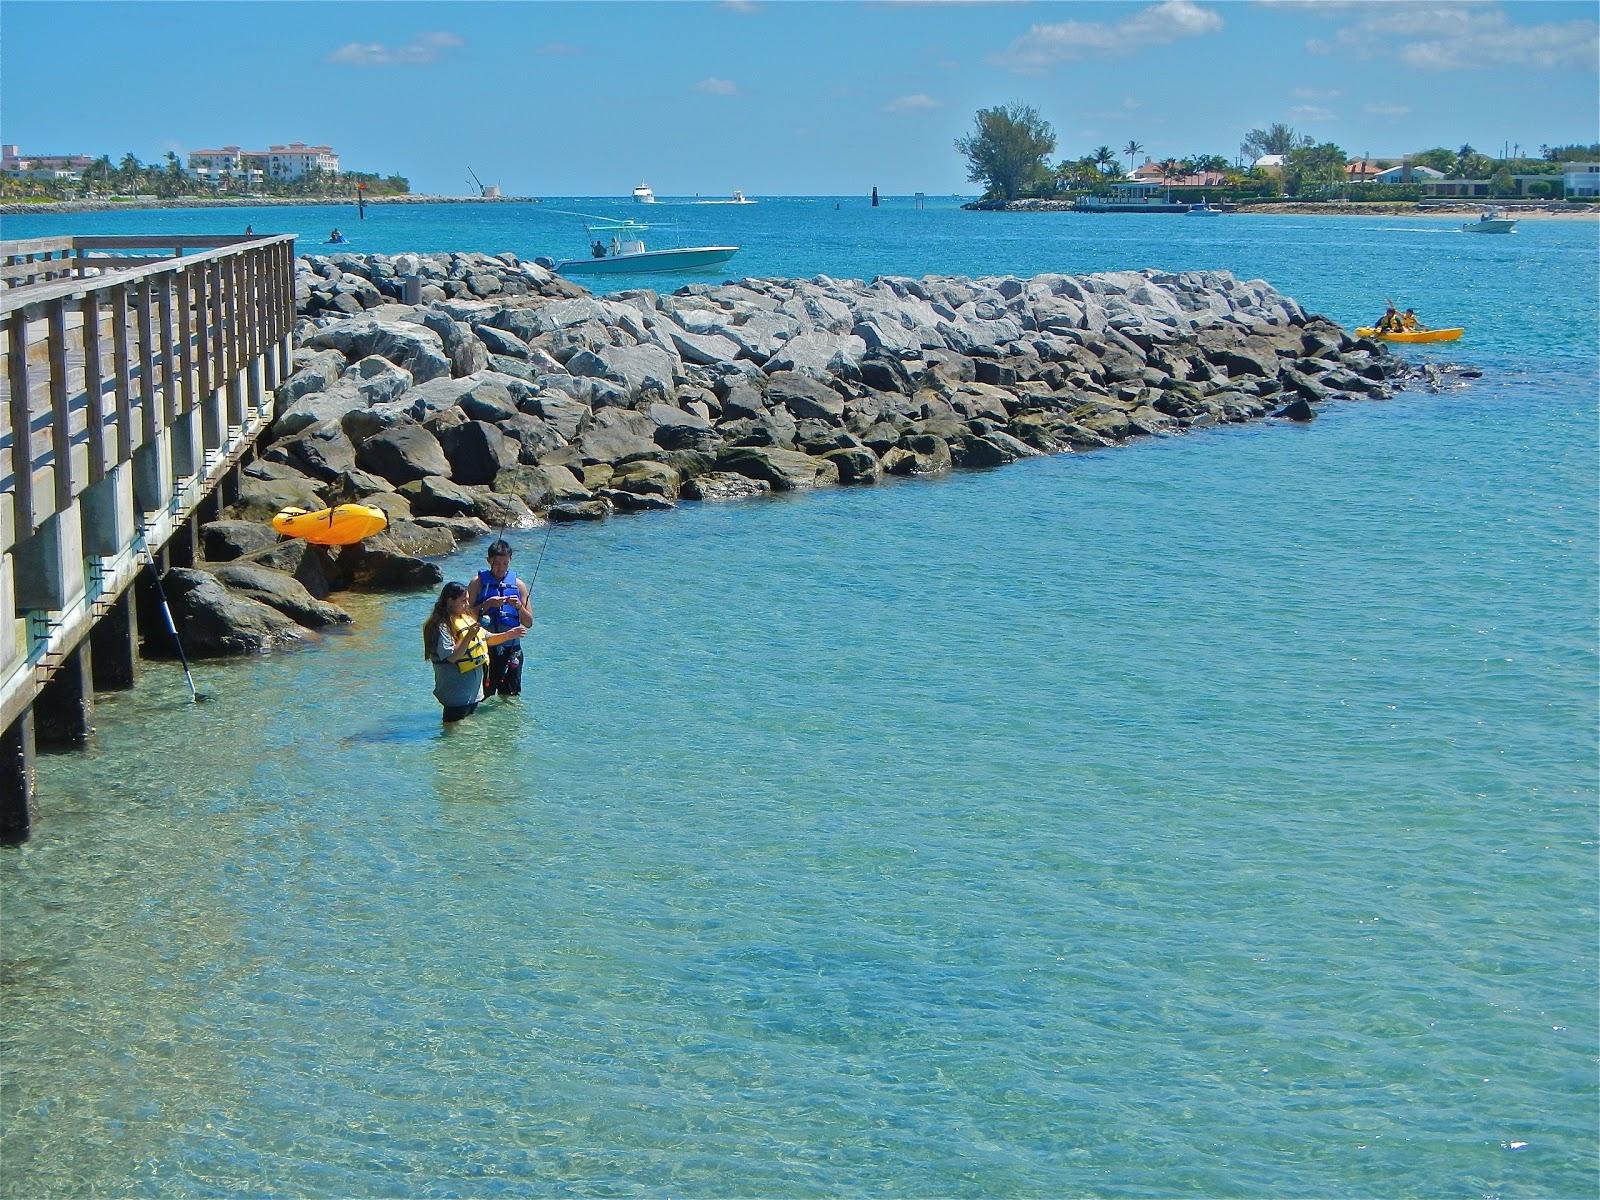 Florida fishing academy boynton beach high school and for Boynton beach fishing